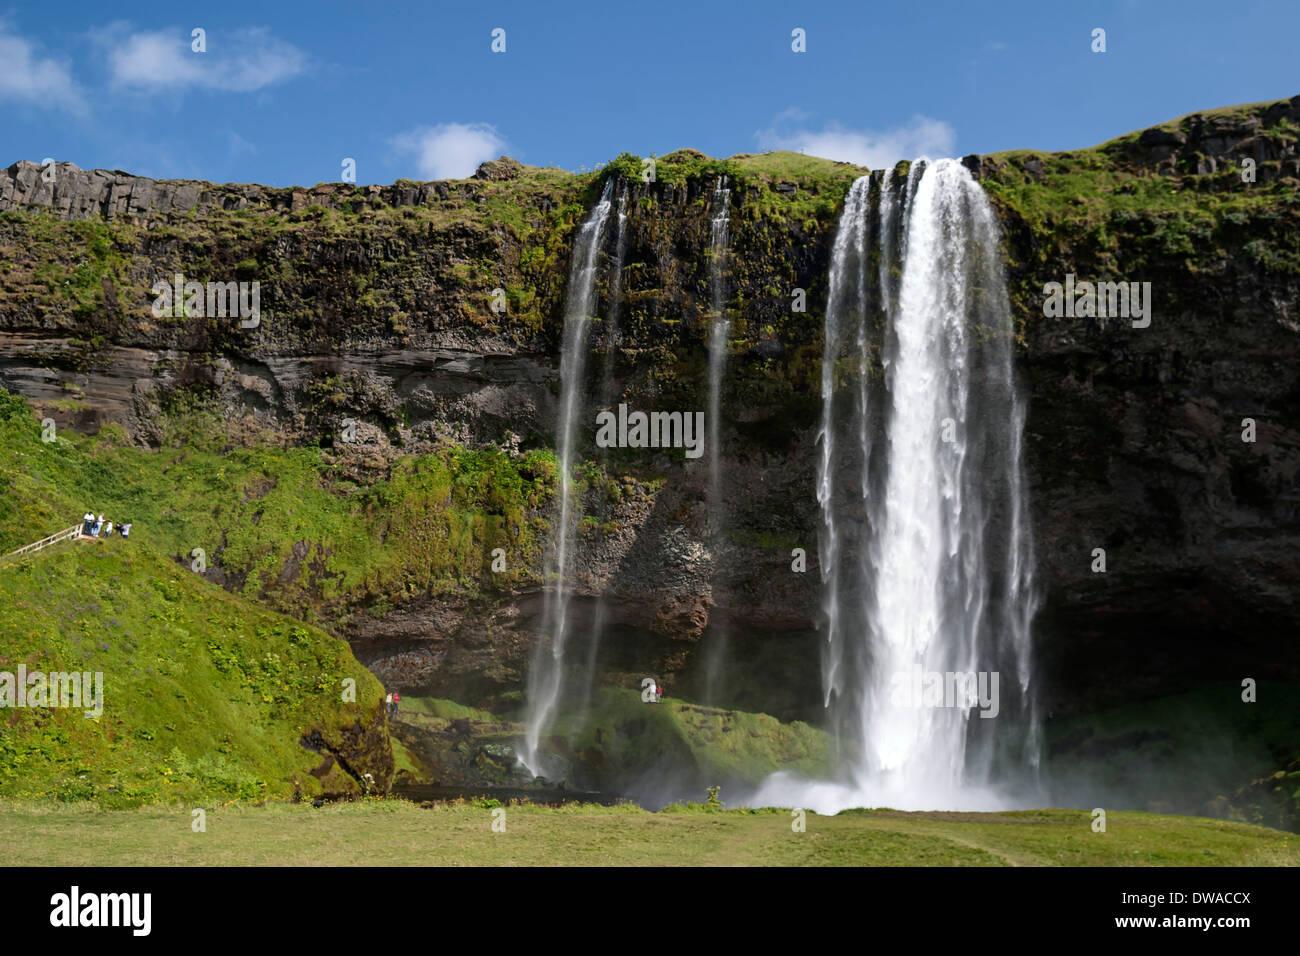 Seljalandsfoss waterfall in south Iceland - Stock Image